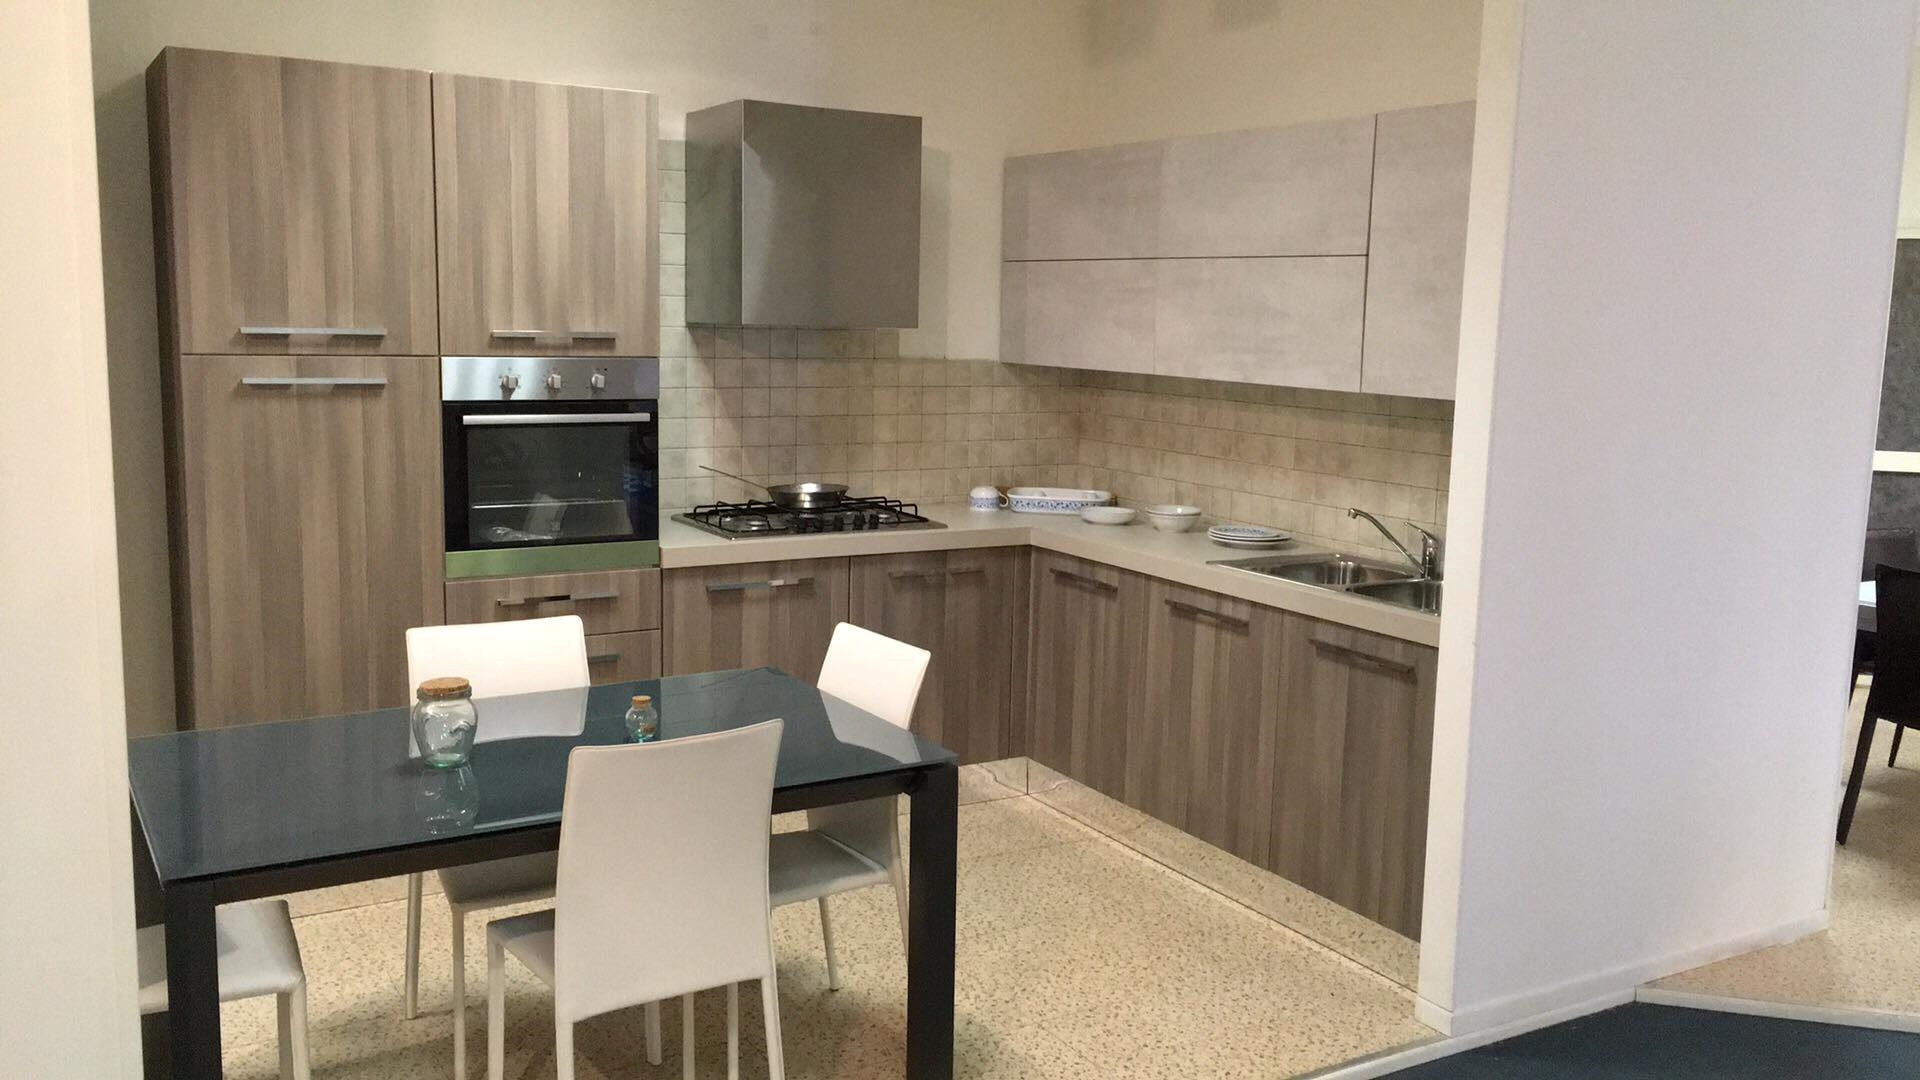 Offerta cucina ad angolo astra cucine misura 300x240cm - Cucina a angolo ...